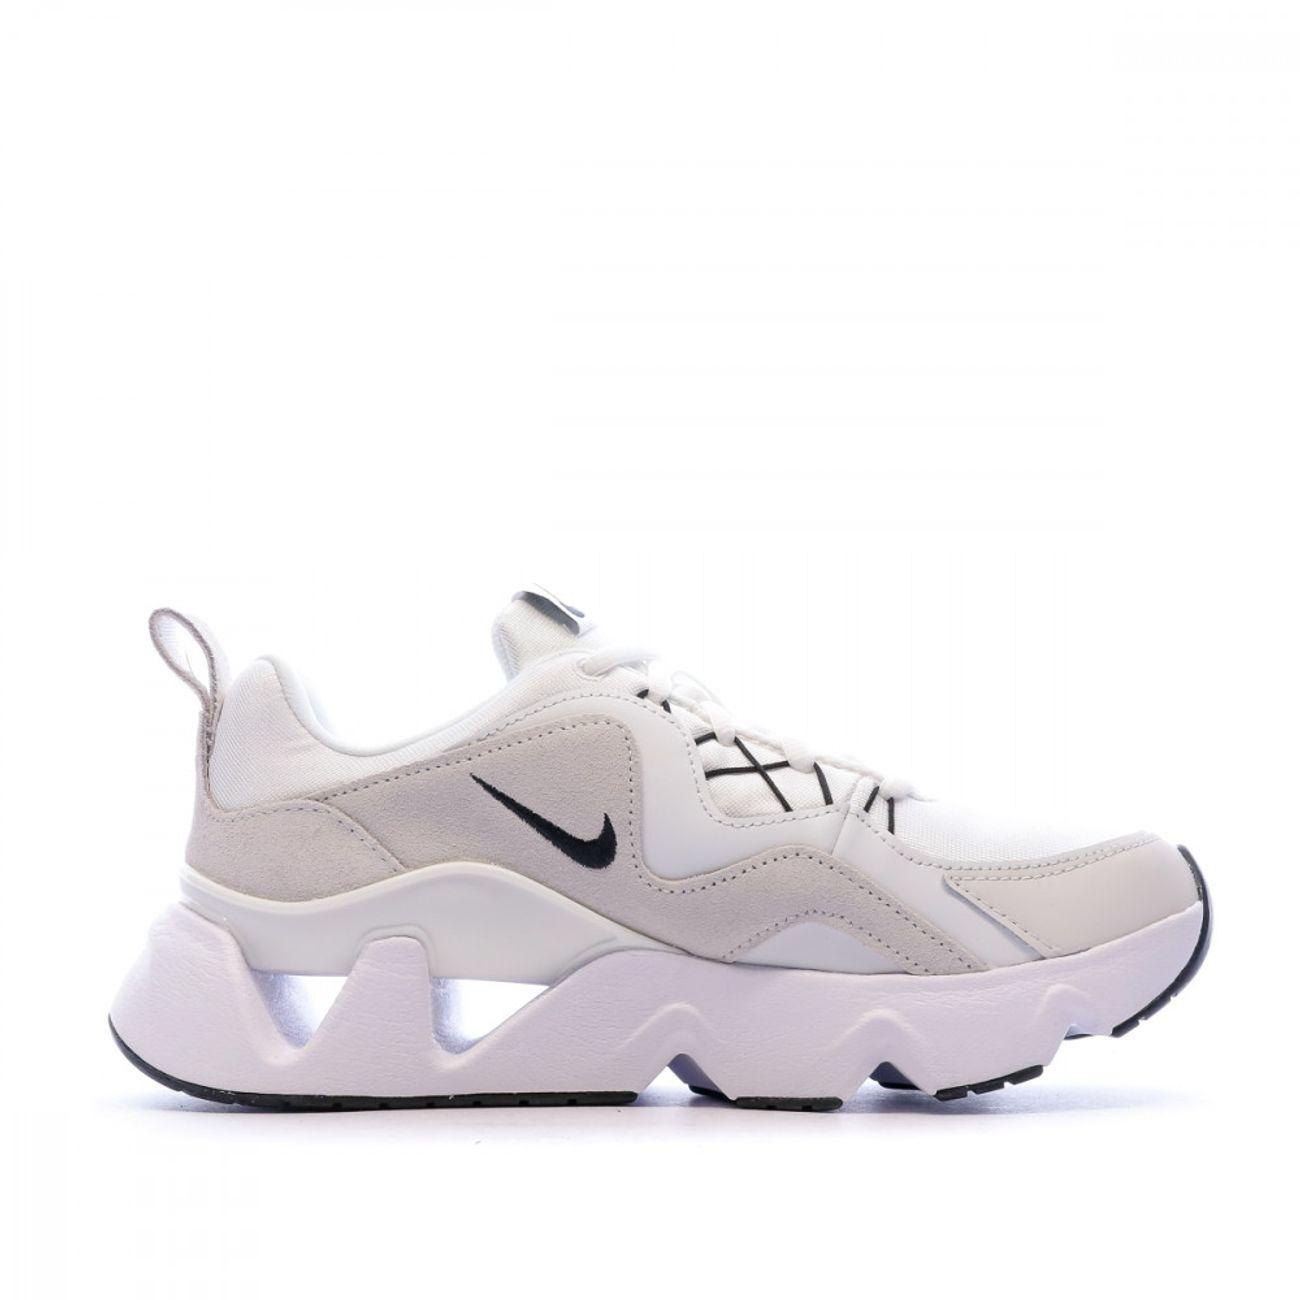 Mode- Lifestyle femme NIKE Baskets Blanches Femme Nike Ryz 365